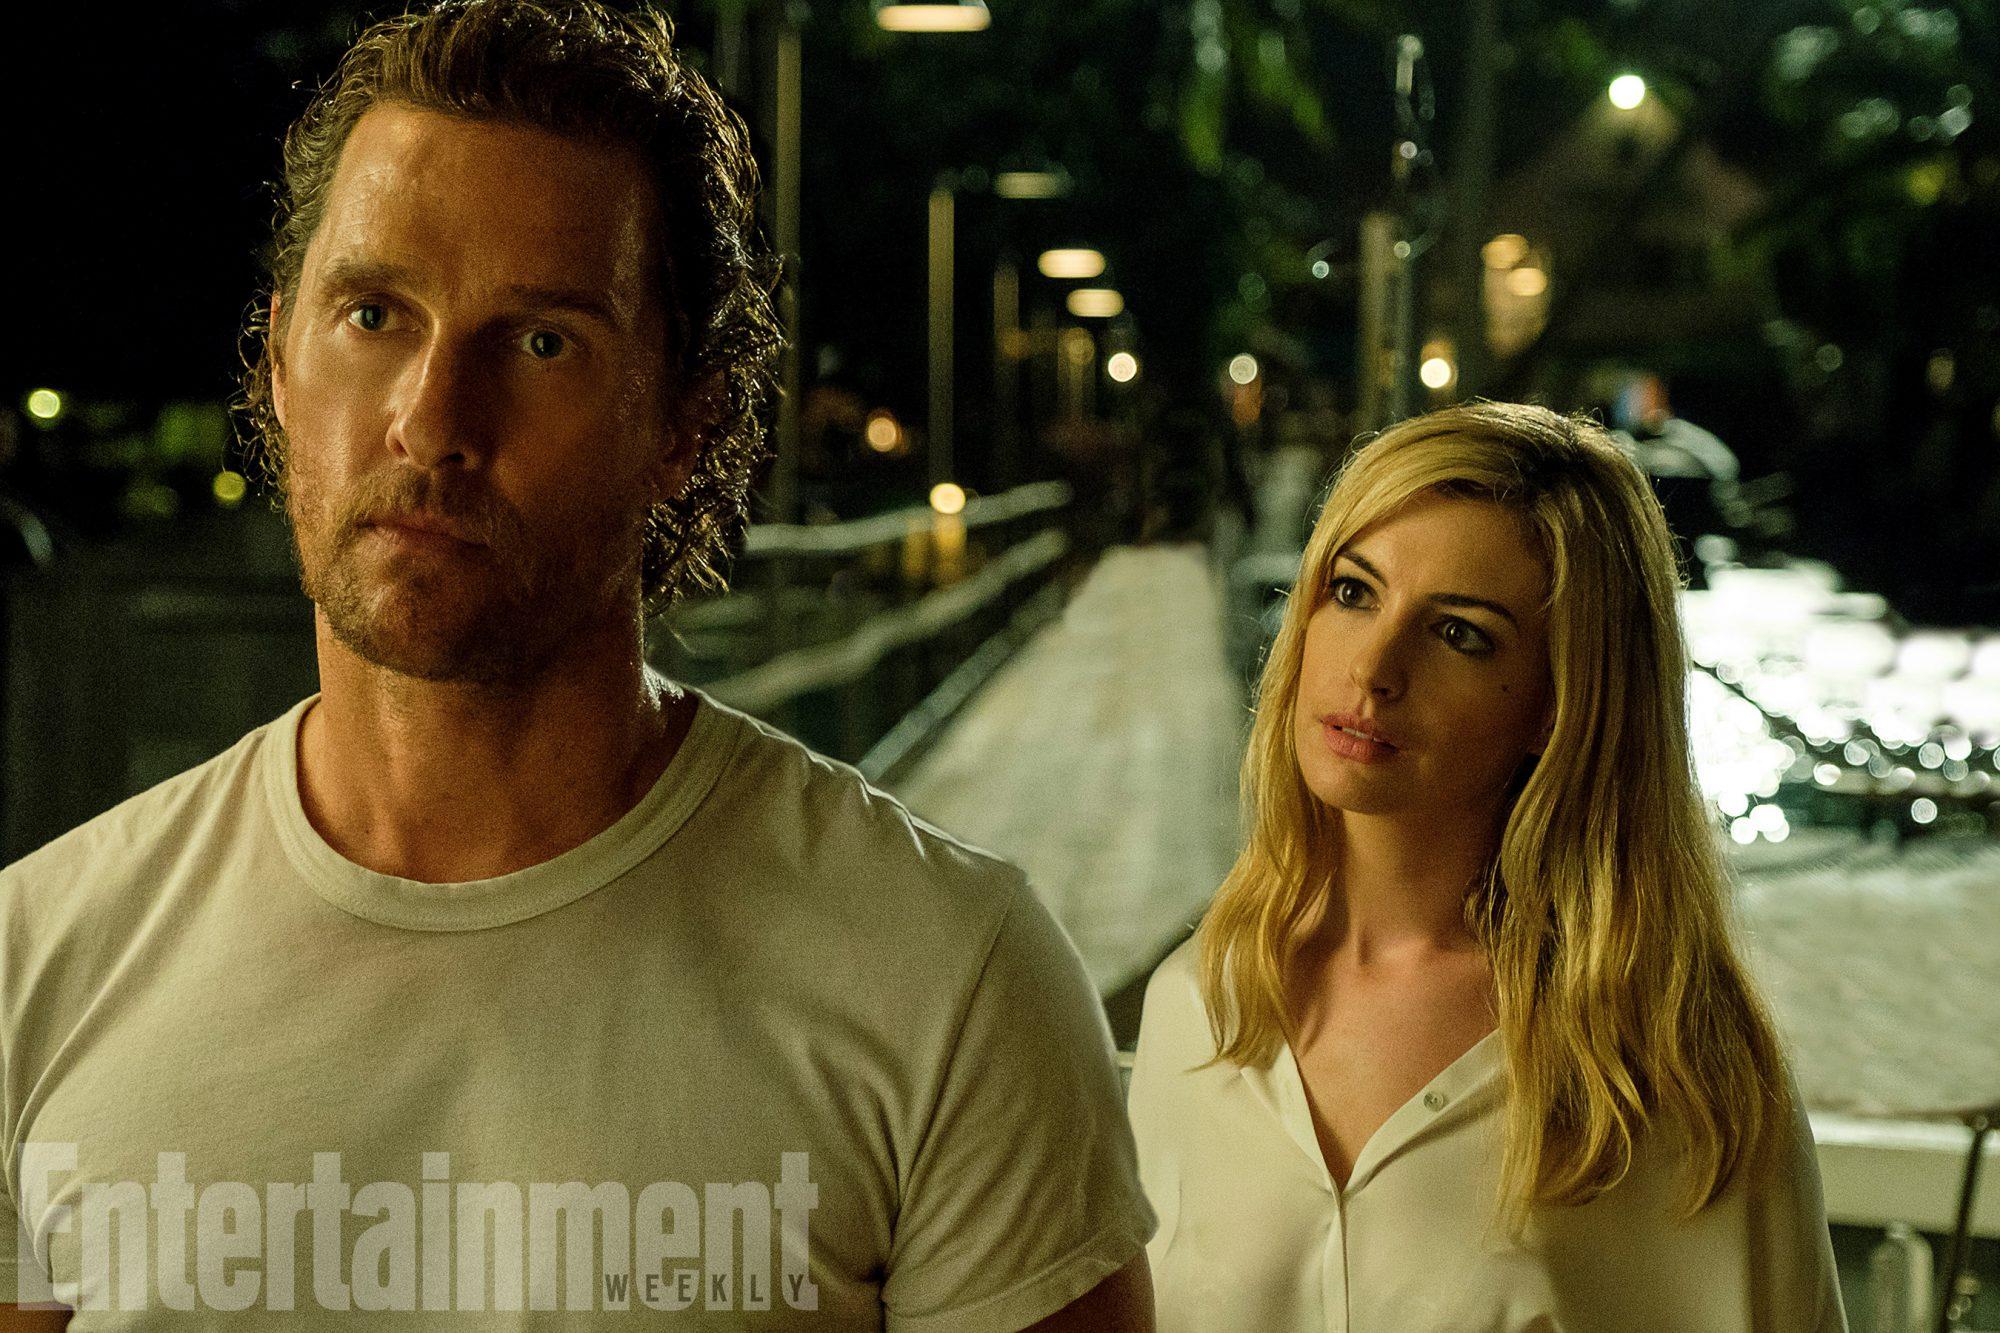 Matthew-McConaughey-and-Anne-Hathaway_Serenity